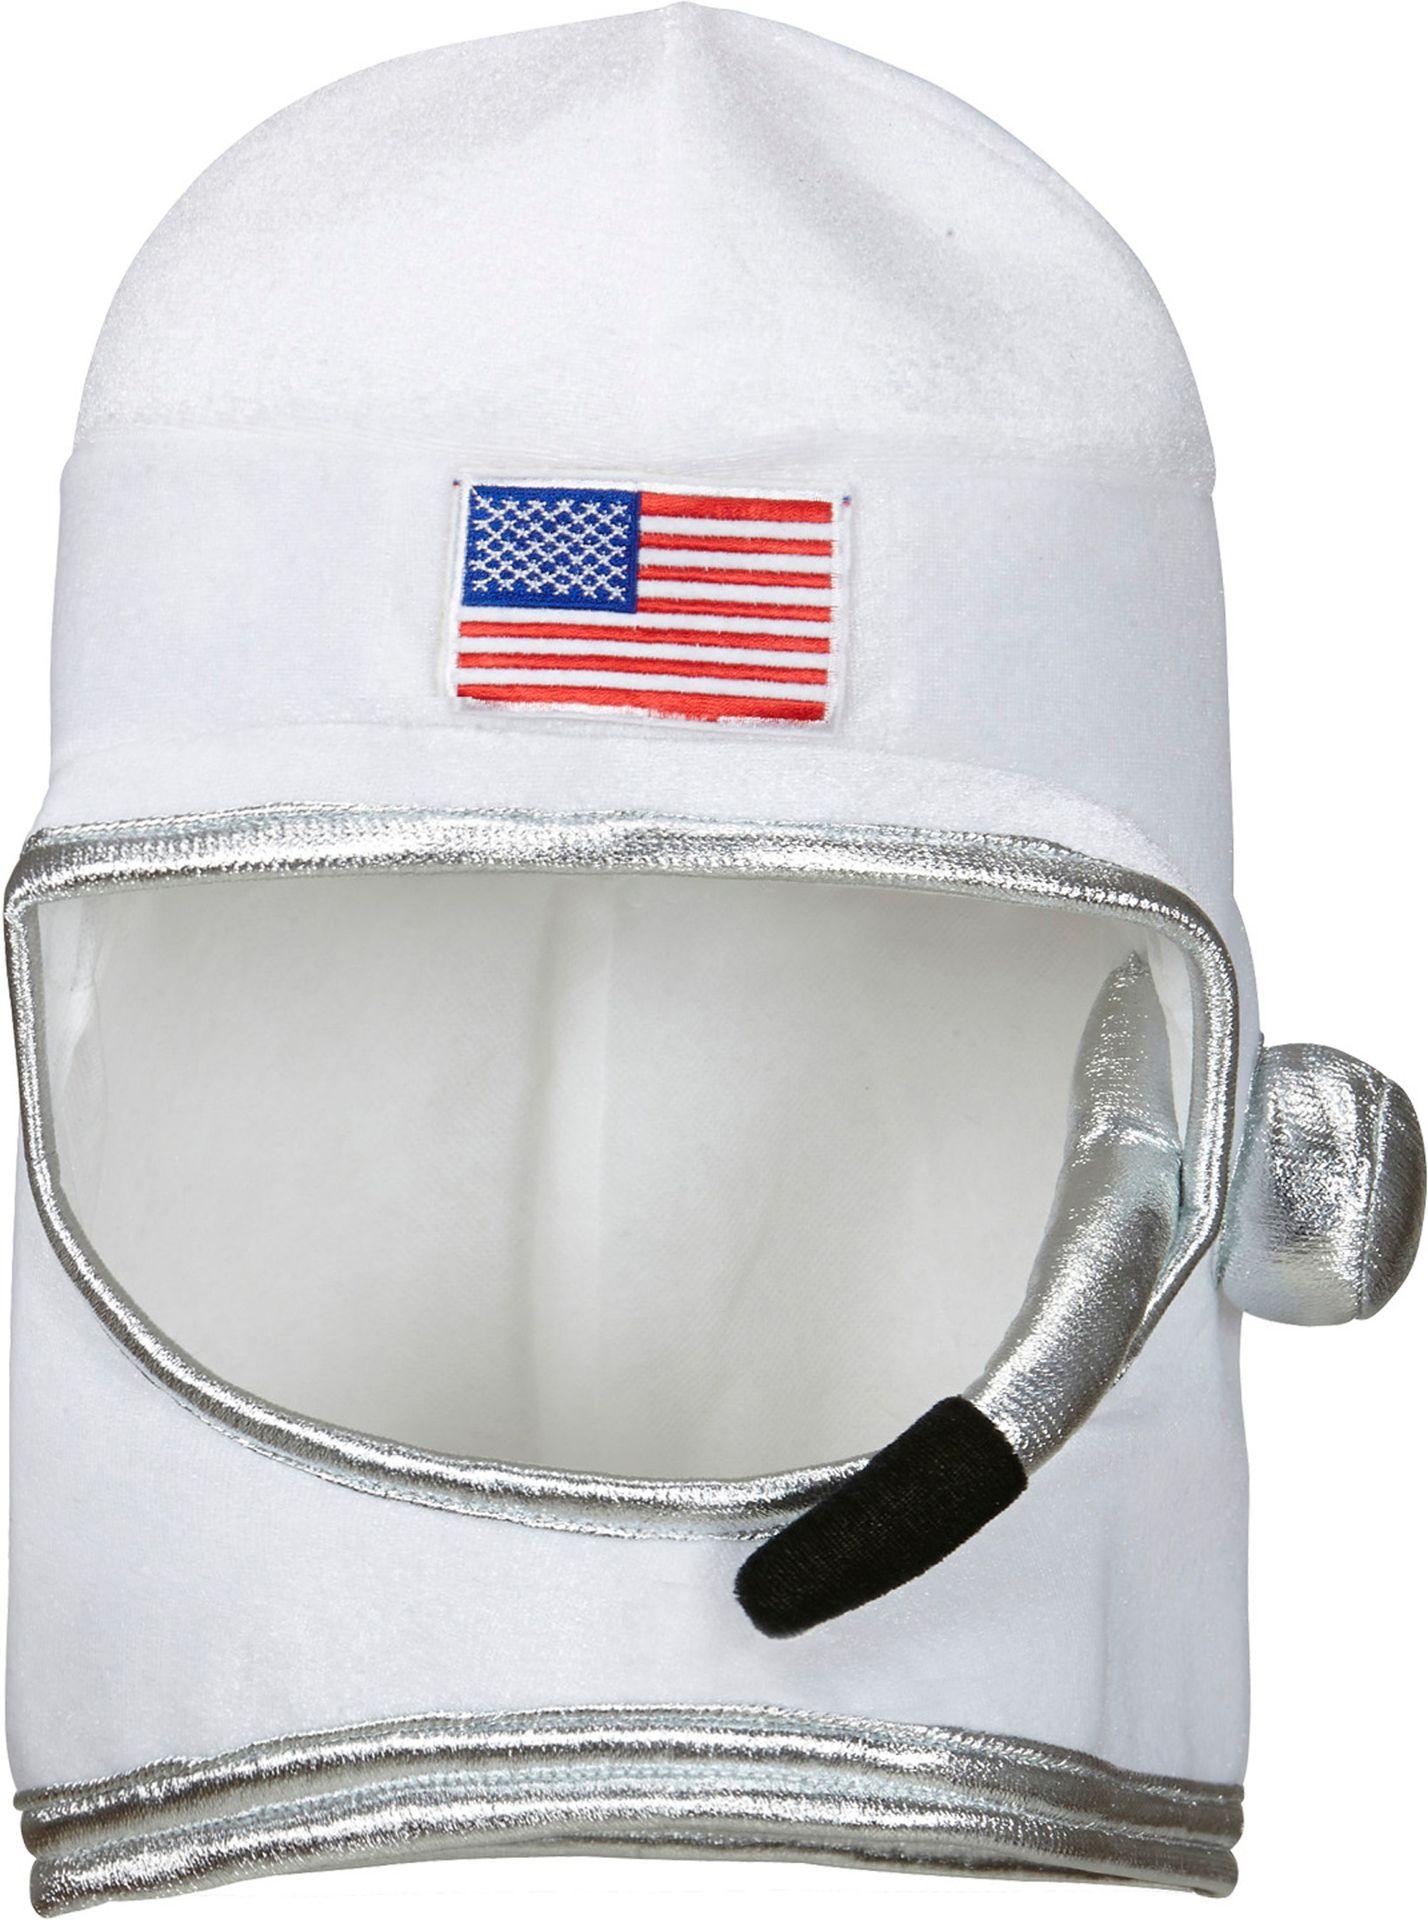 Astronaut helm